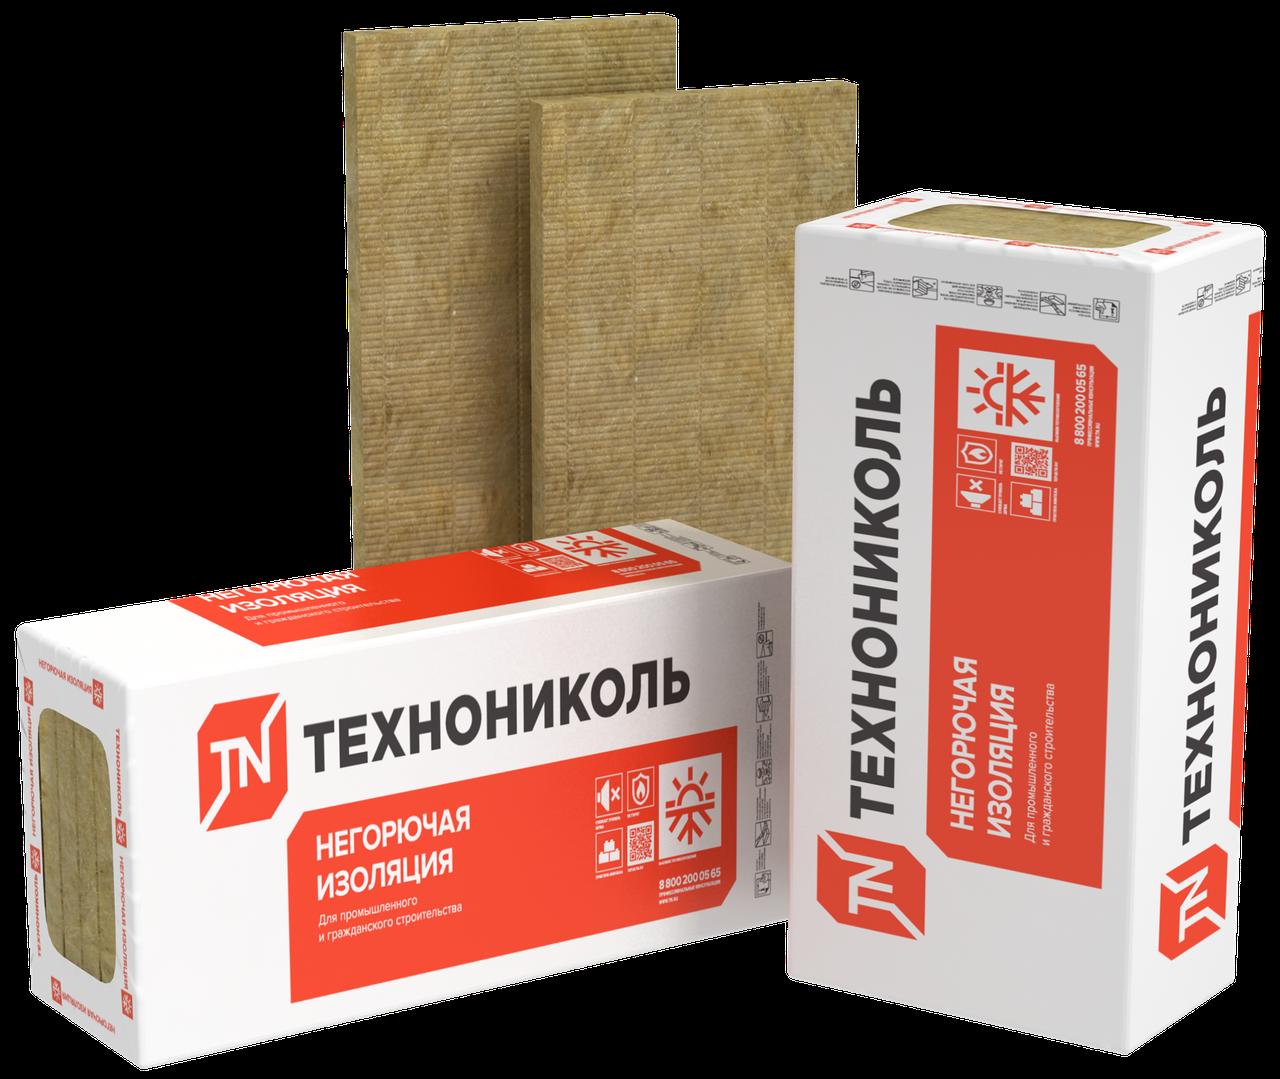 Утеплитель ТЕХНОФАС ОПТИМА 50 мм 120 кг/м3 ТехноНиколь (2.88 м.кв в уп)